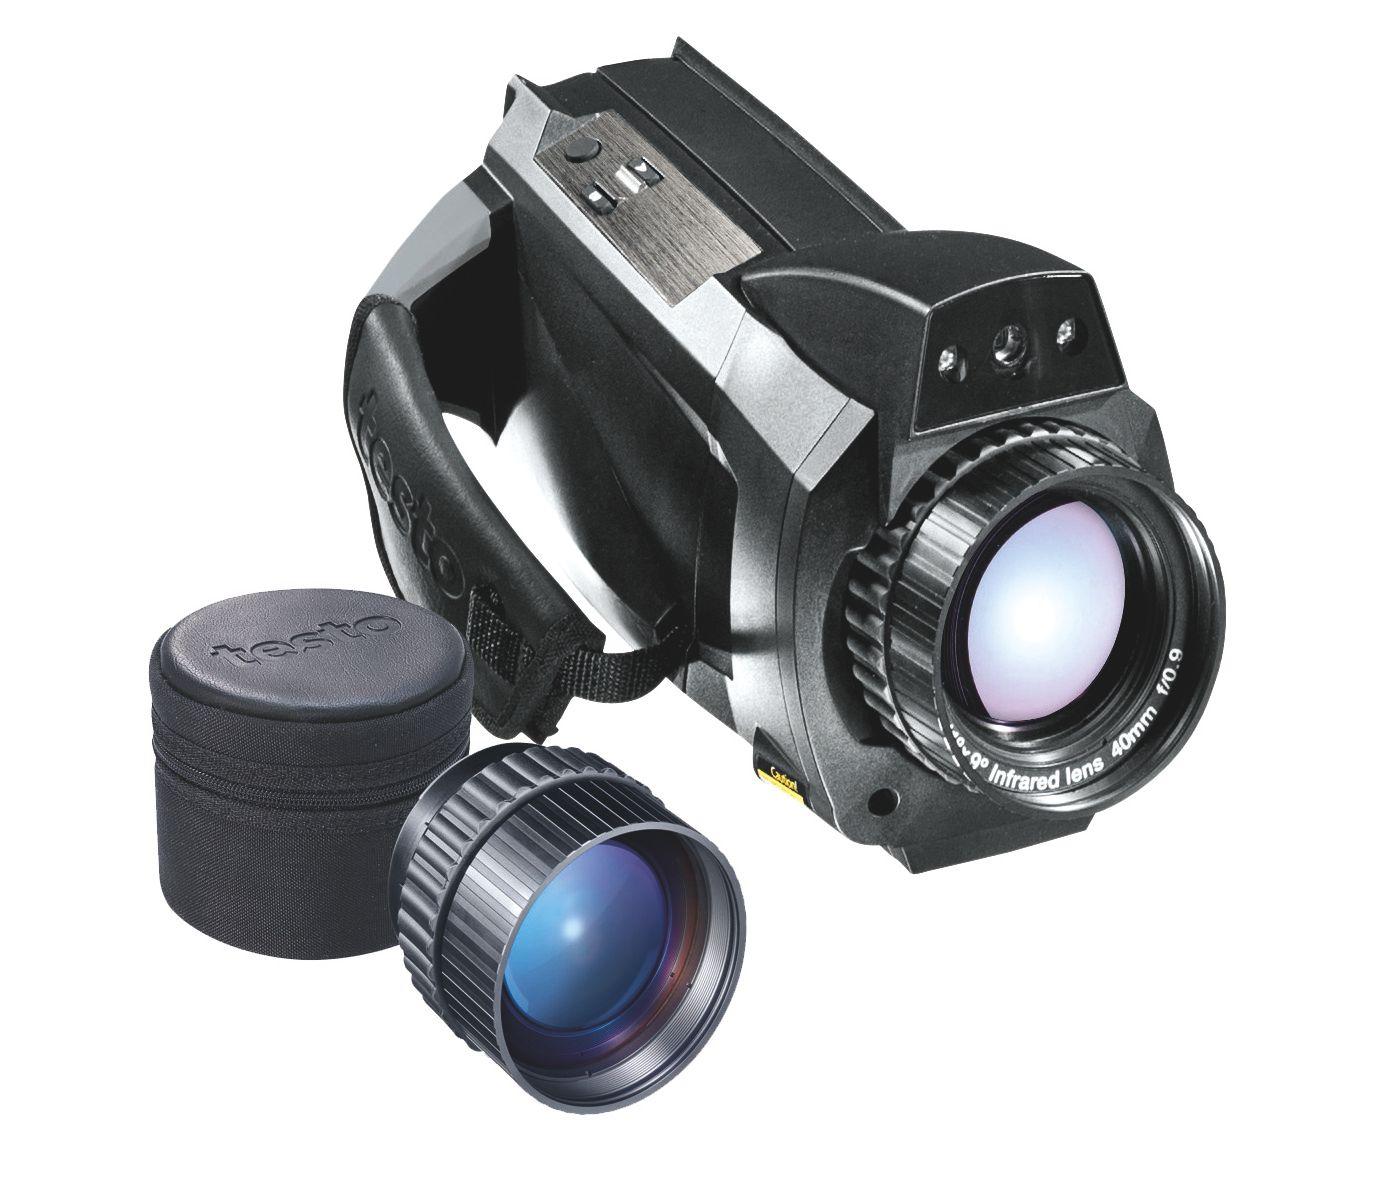 Waermebildkamera-testo-885-mit-Superteleobjektiv-cymk.jpg